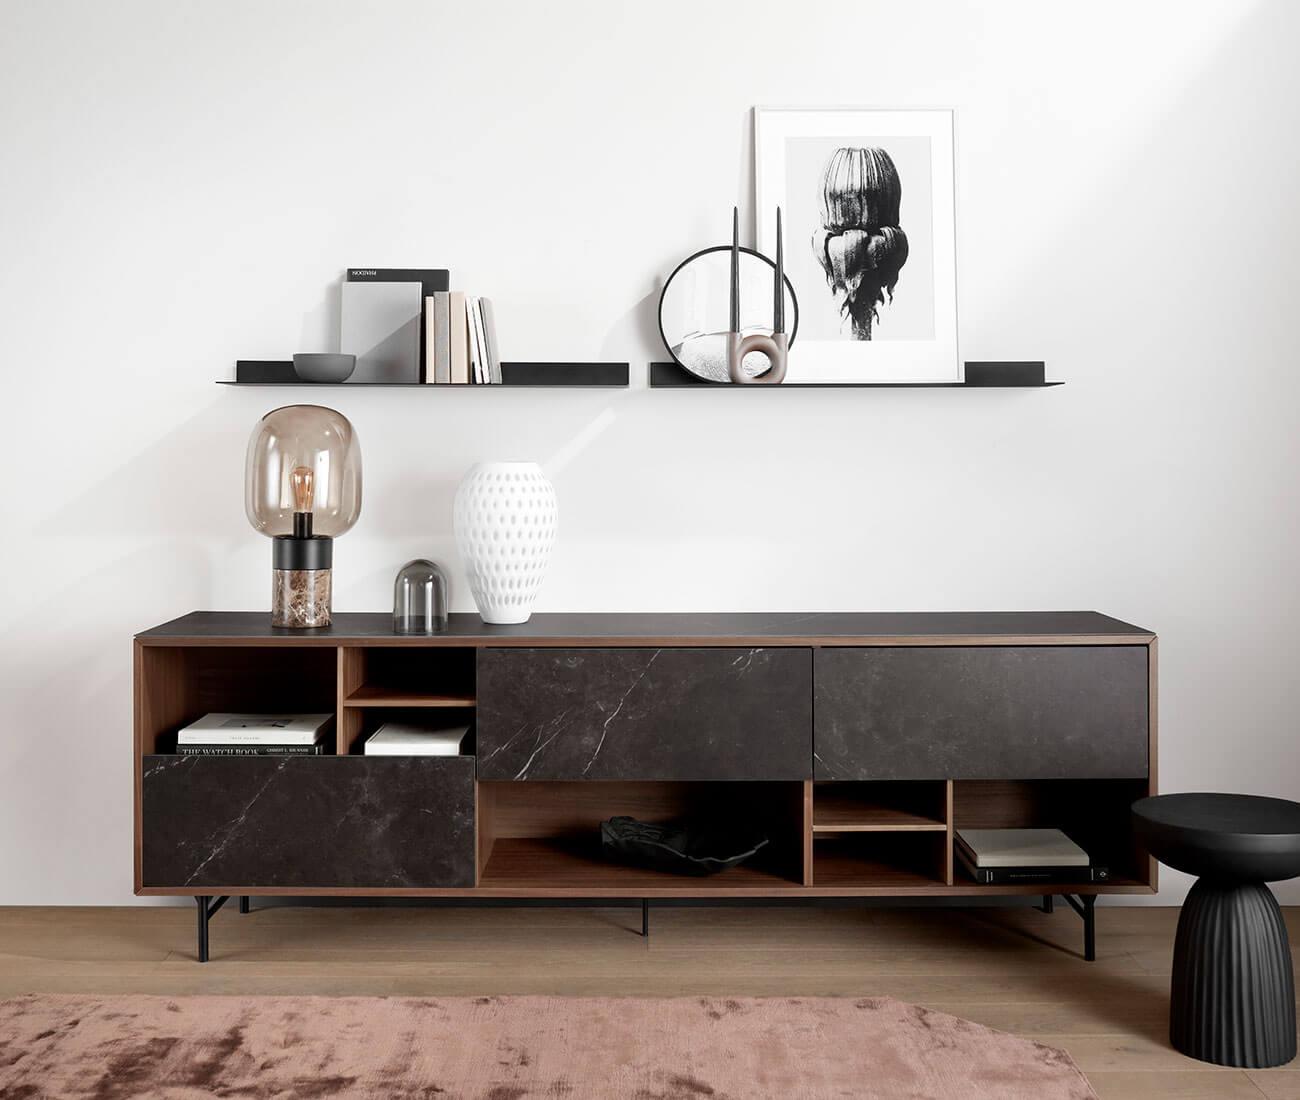 Walnut veneer Manhattan sideboard and black Como shelf